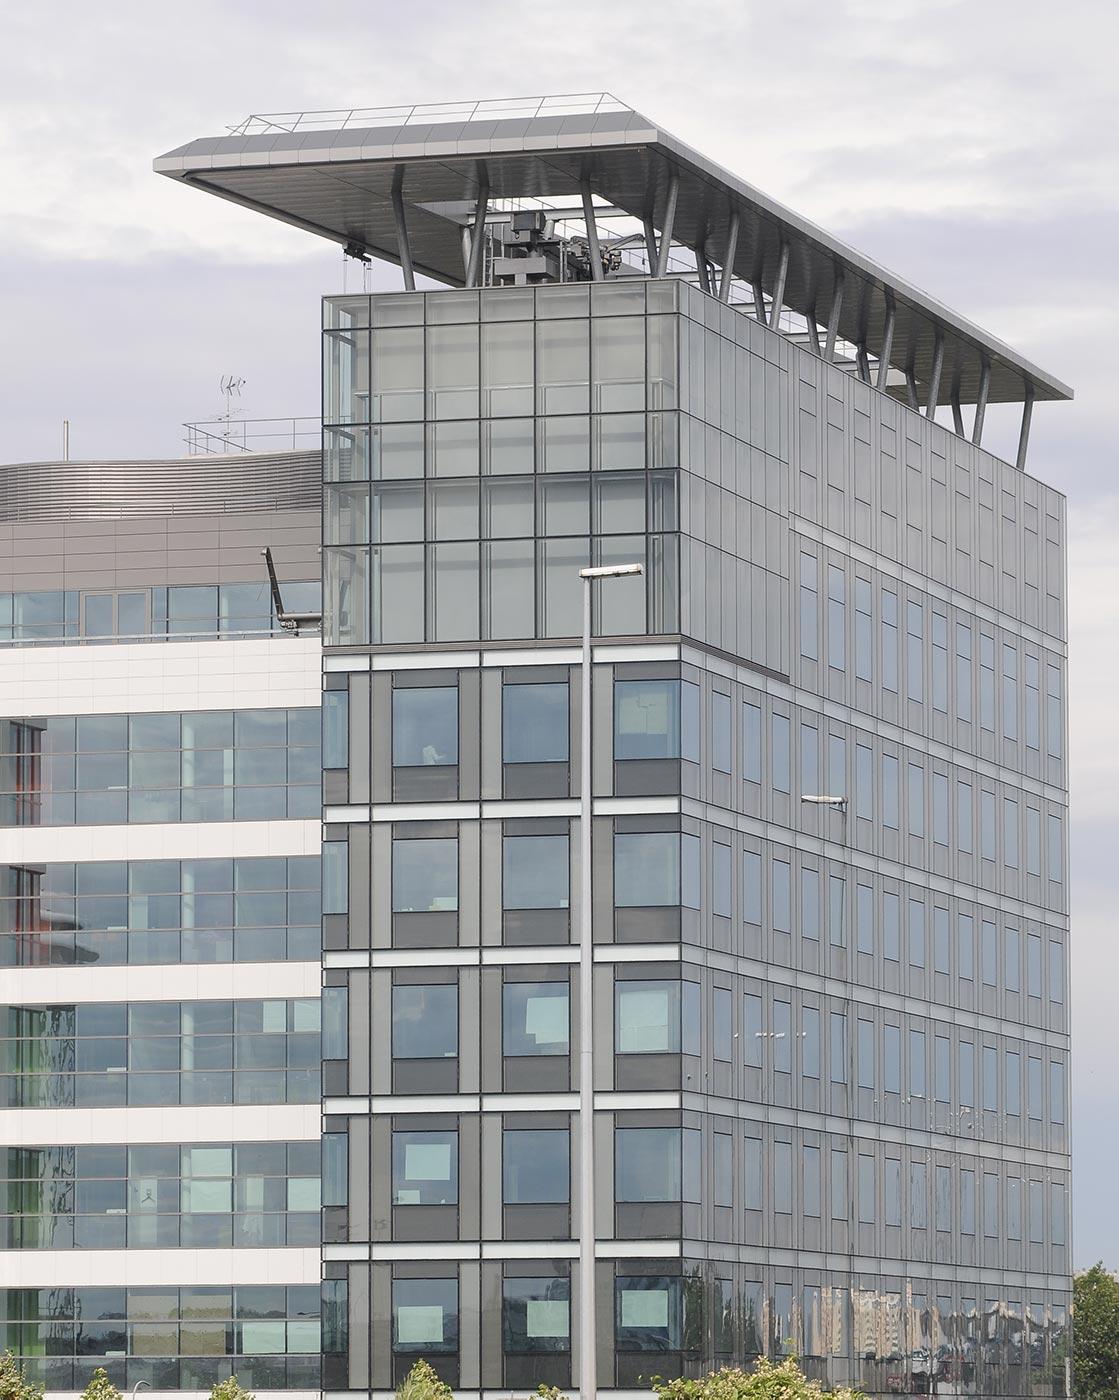 Edificio-PORTES.-Francia.-LARSON-SILVER-1_1591961421.jpg